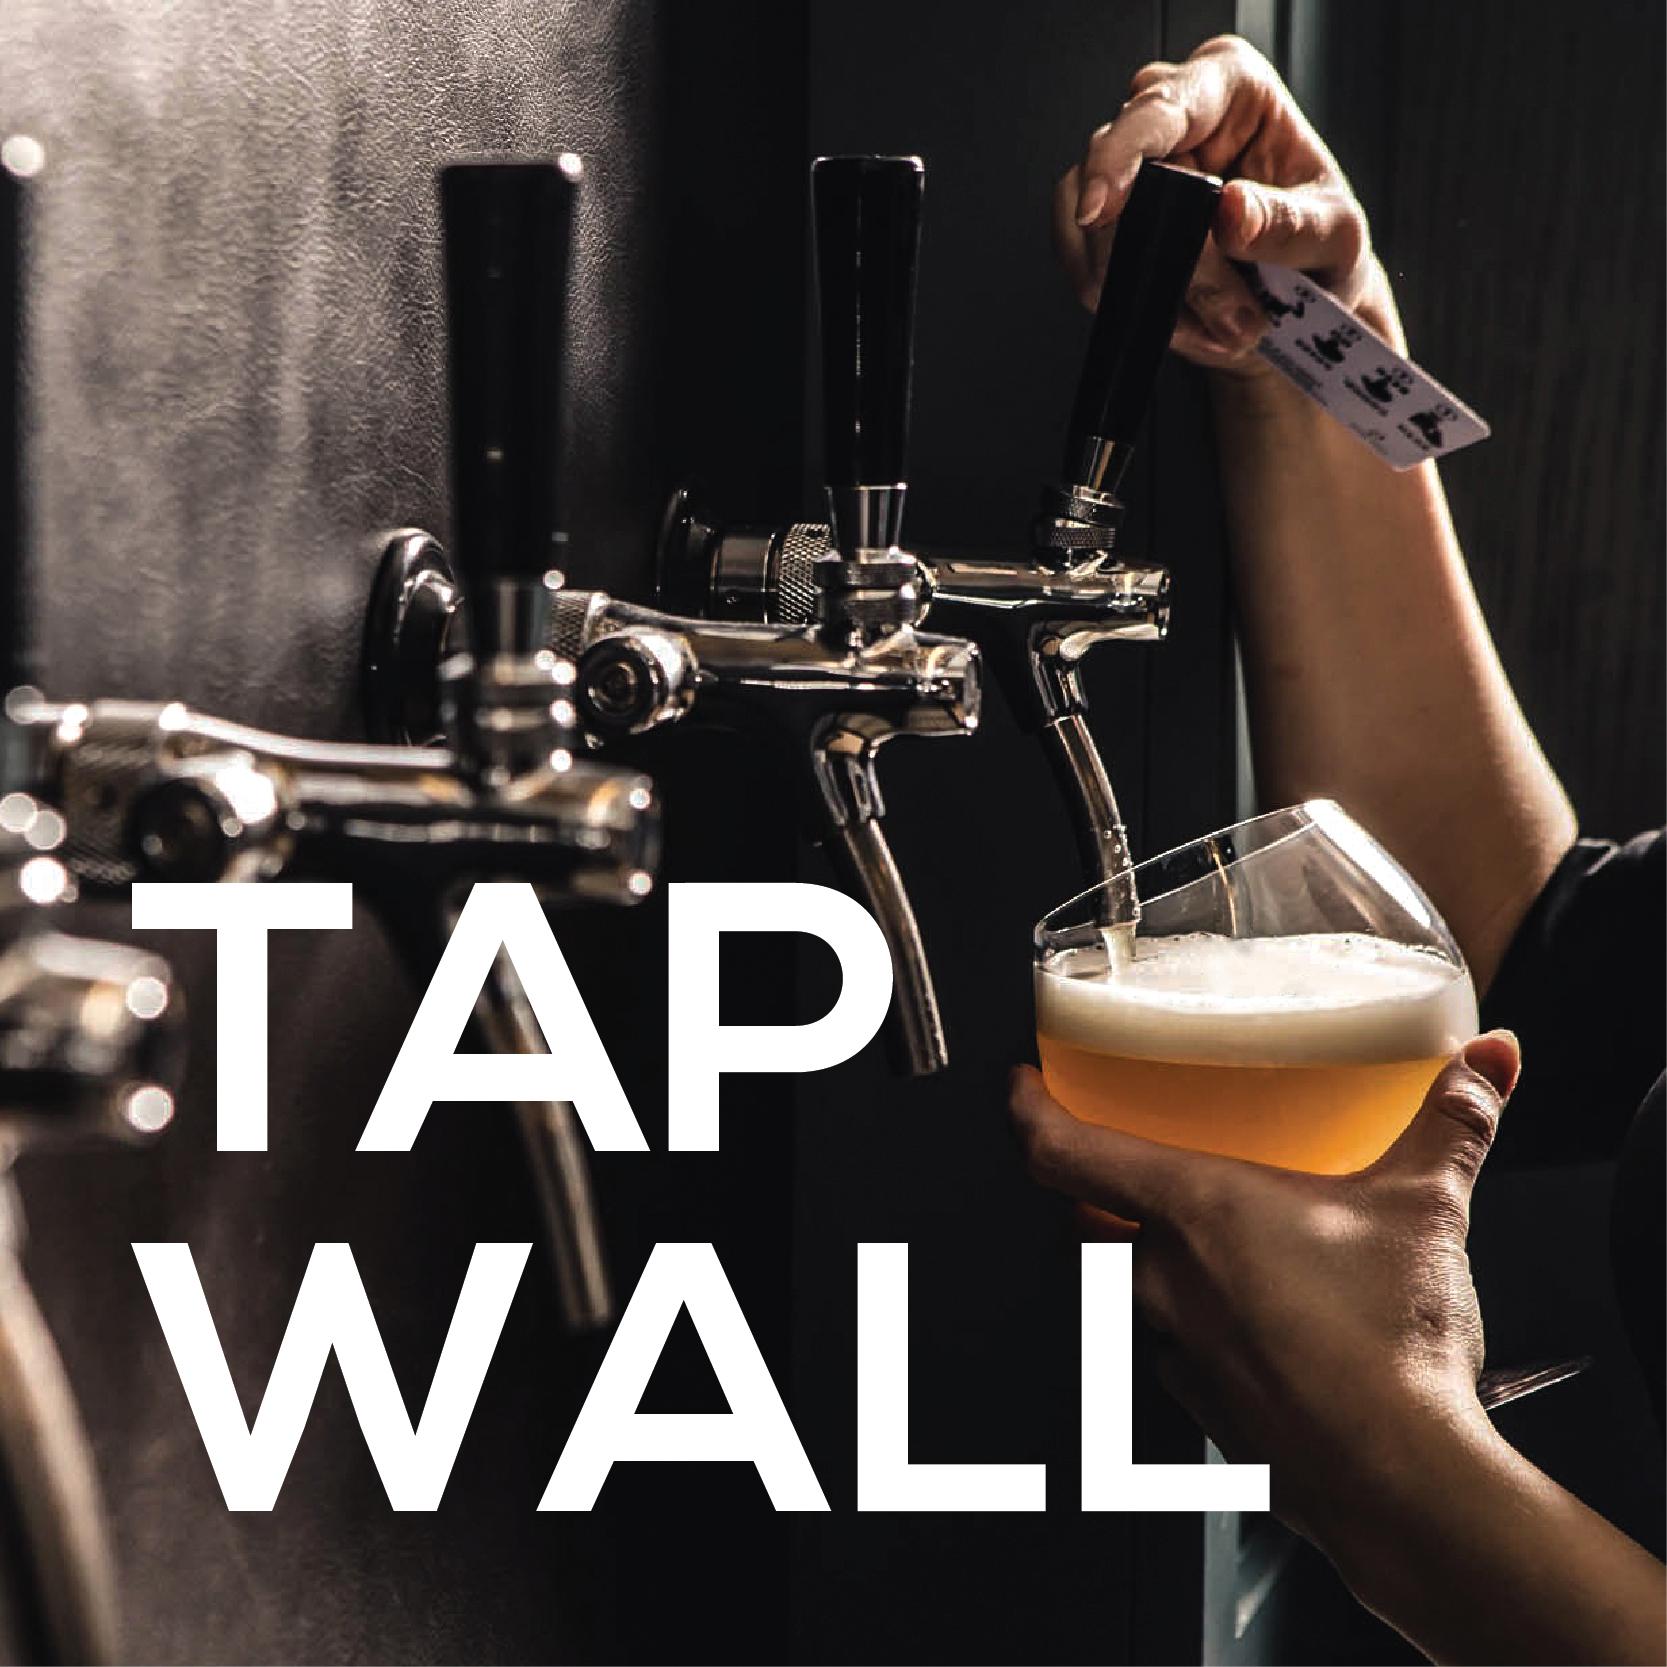 Tap Walls